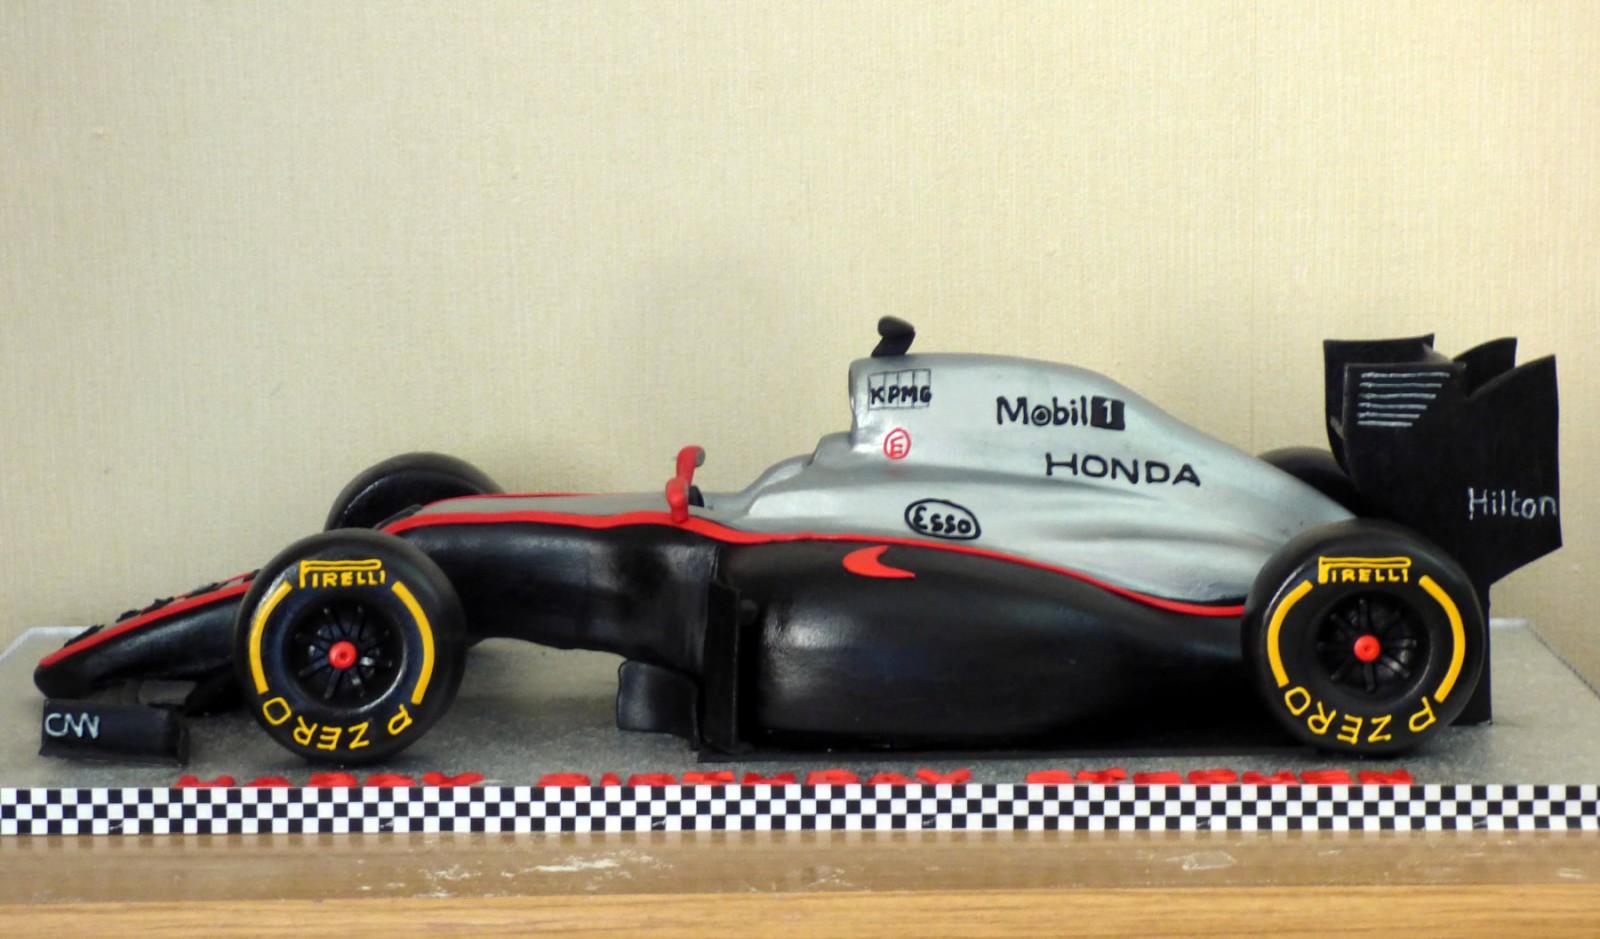 McLaren F1 2015 Race Car Birthday Cake Susies Cakes